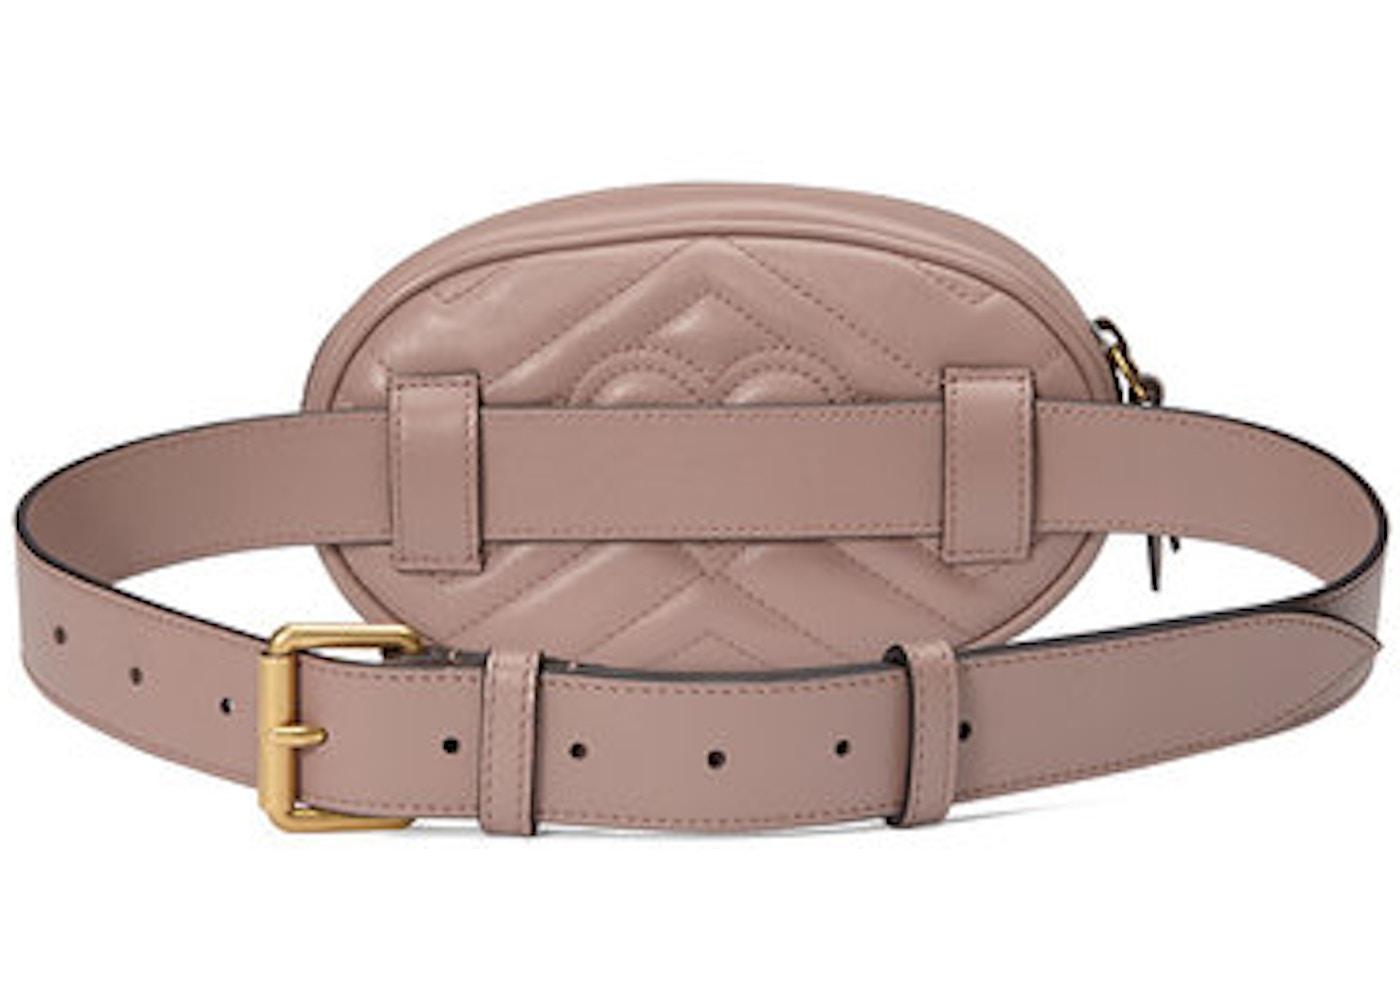 Gucci GG Marmont Belt Bag Matelasse Dusty Pink